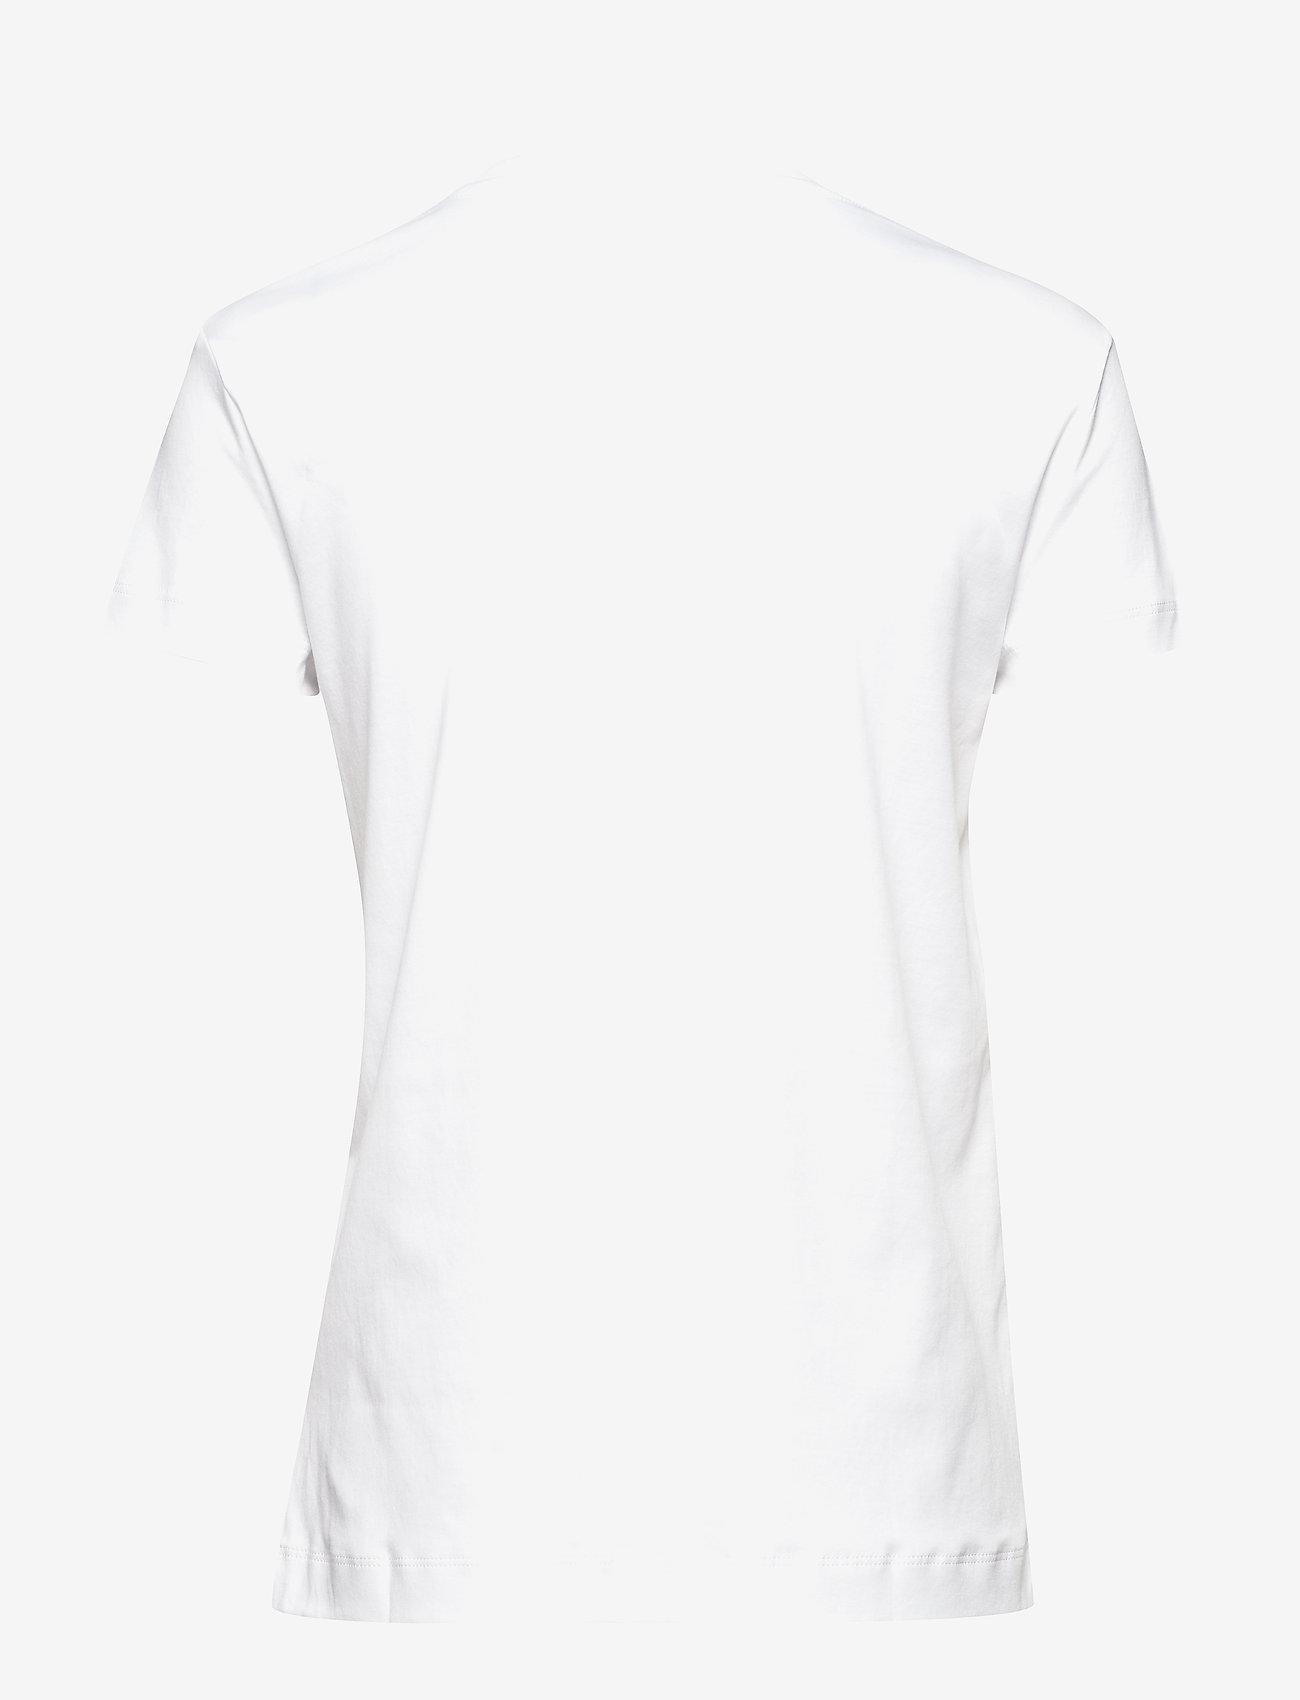 Zadig & Voltaire - WALK BLASON PERM COTTON T-SHIRT - t-shirts - white - 1